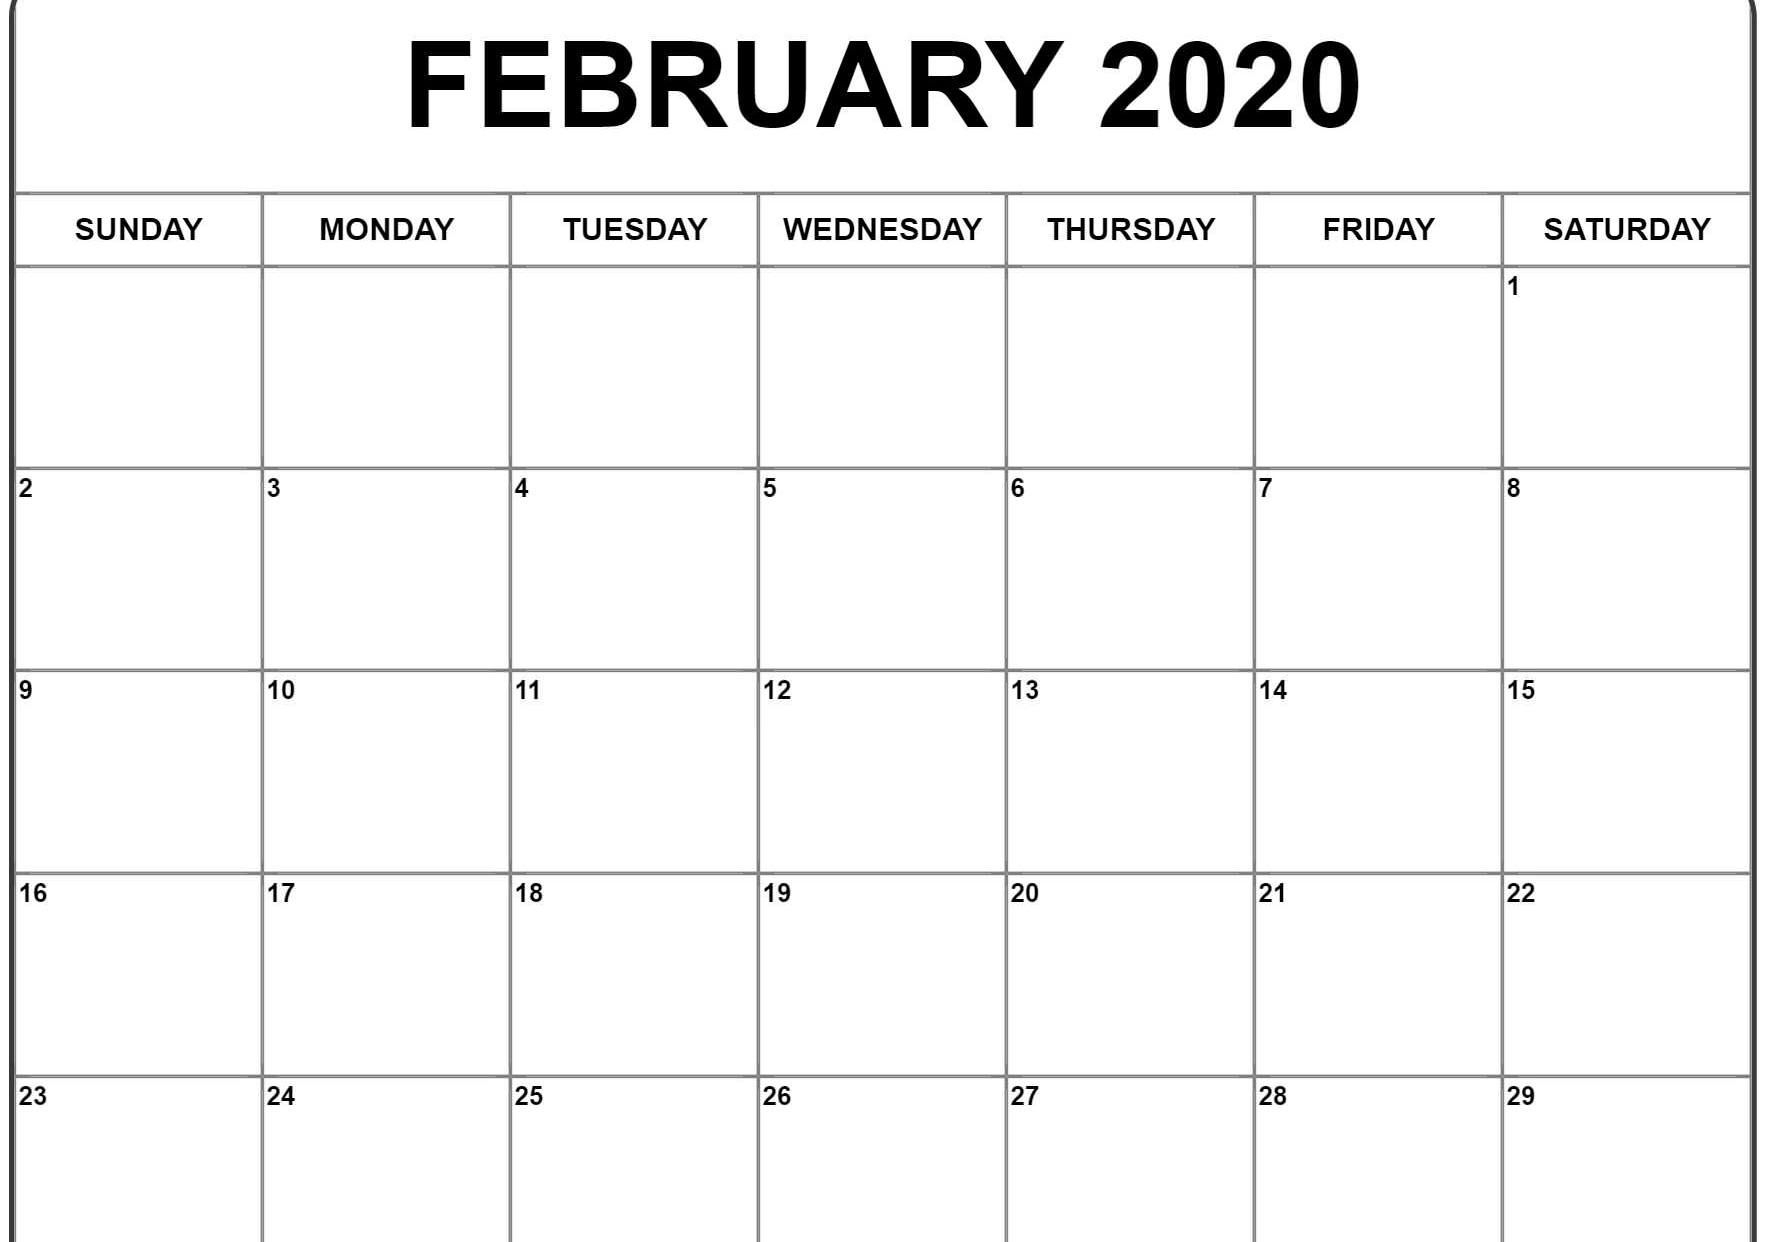 February 2020 Calendar Excel | February Calendar, Excel